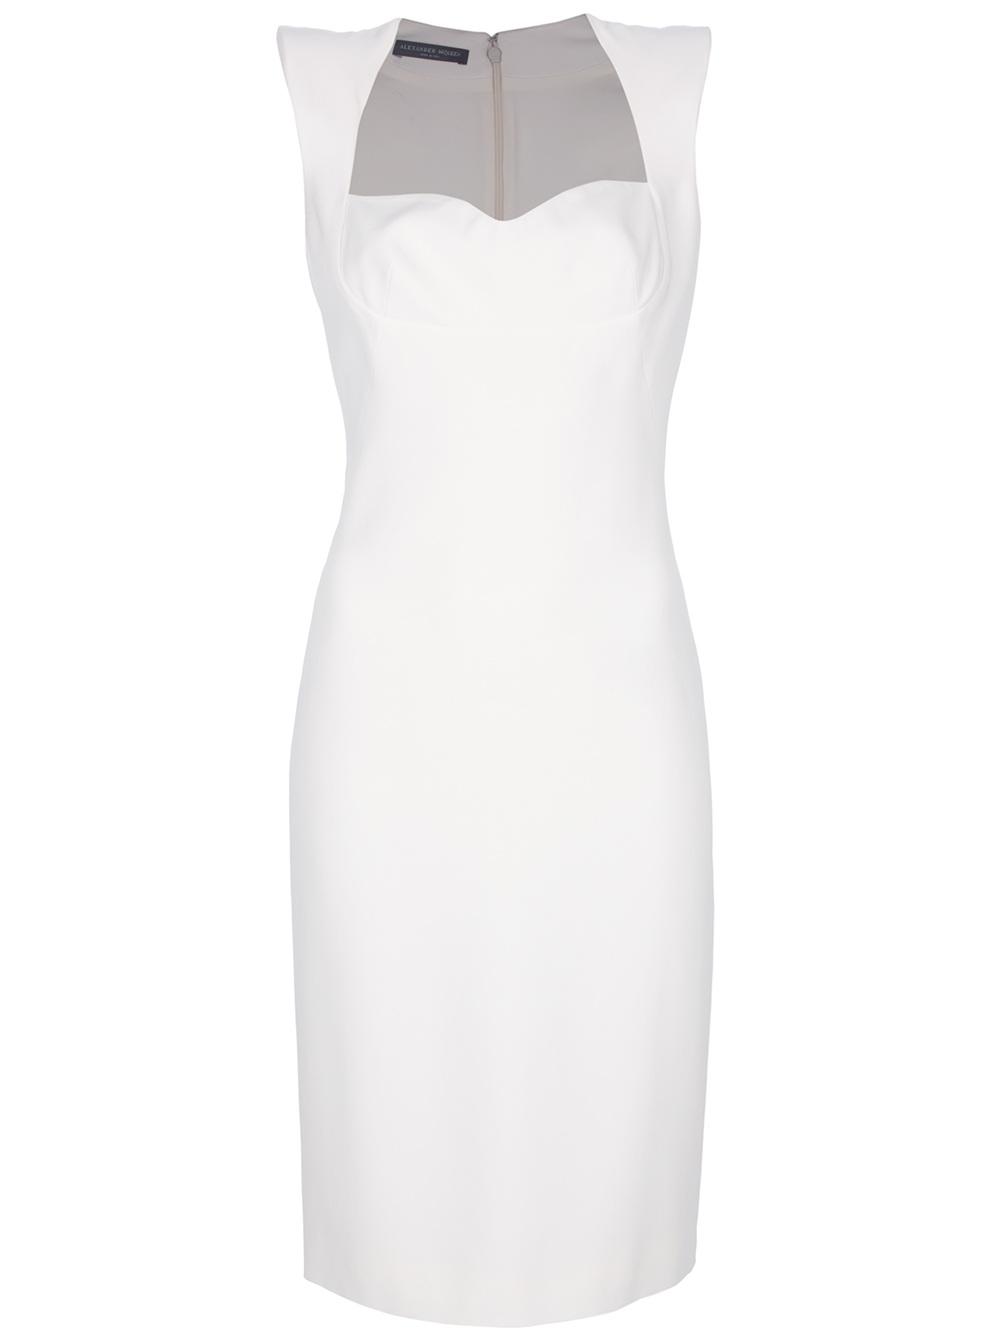 b071beec84a Alexander McQueen Crepe Pencil Dress in White - Lyst